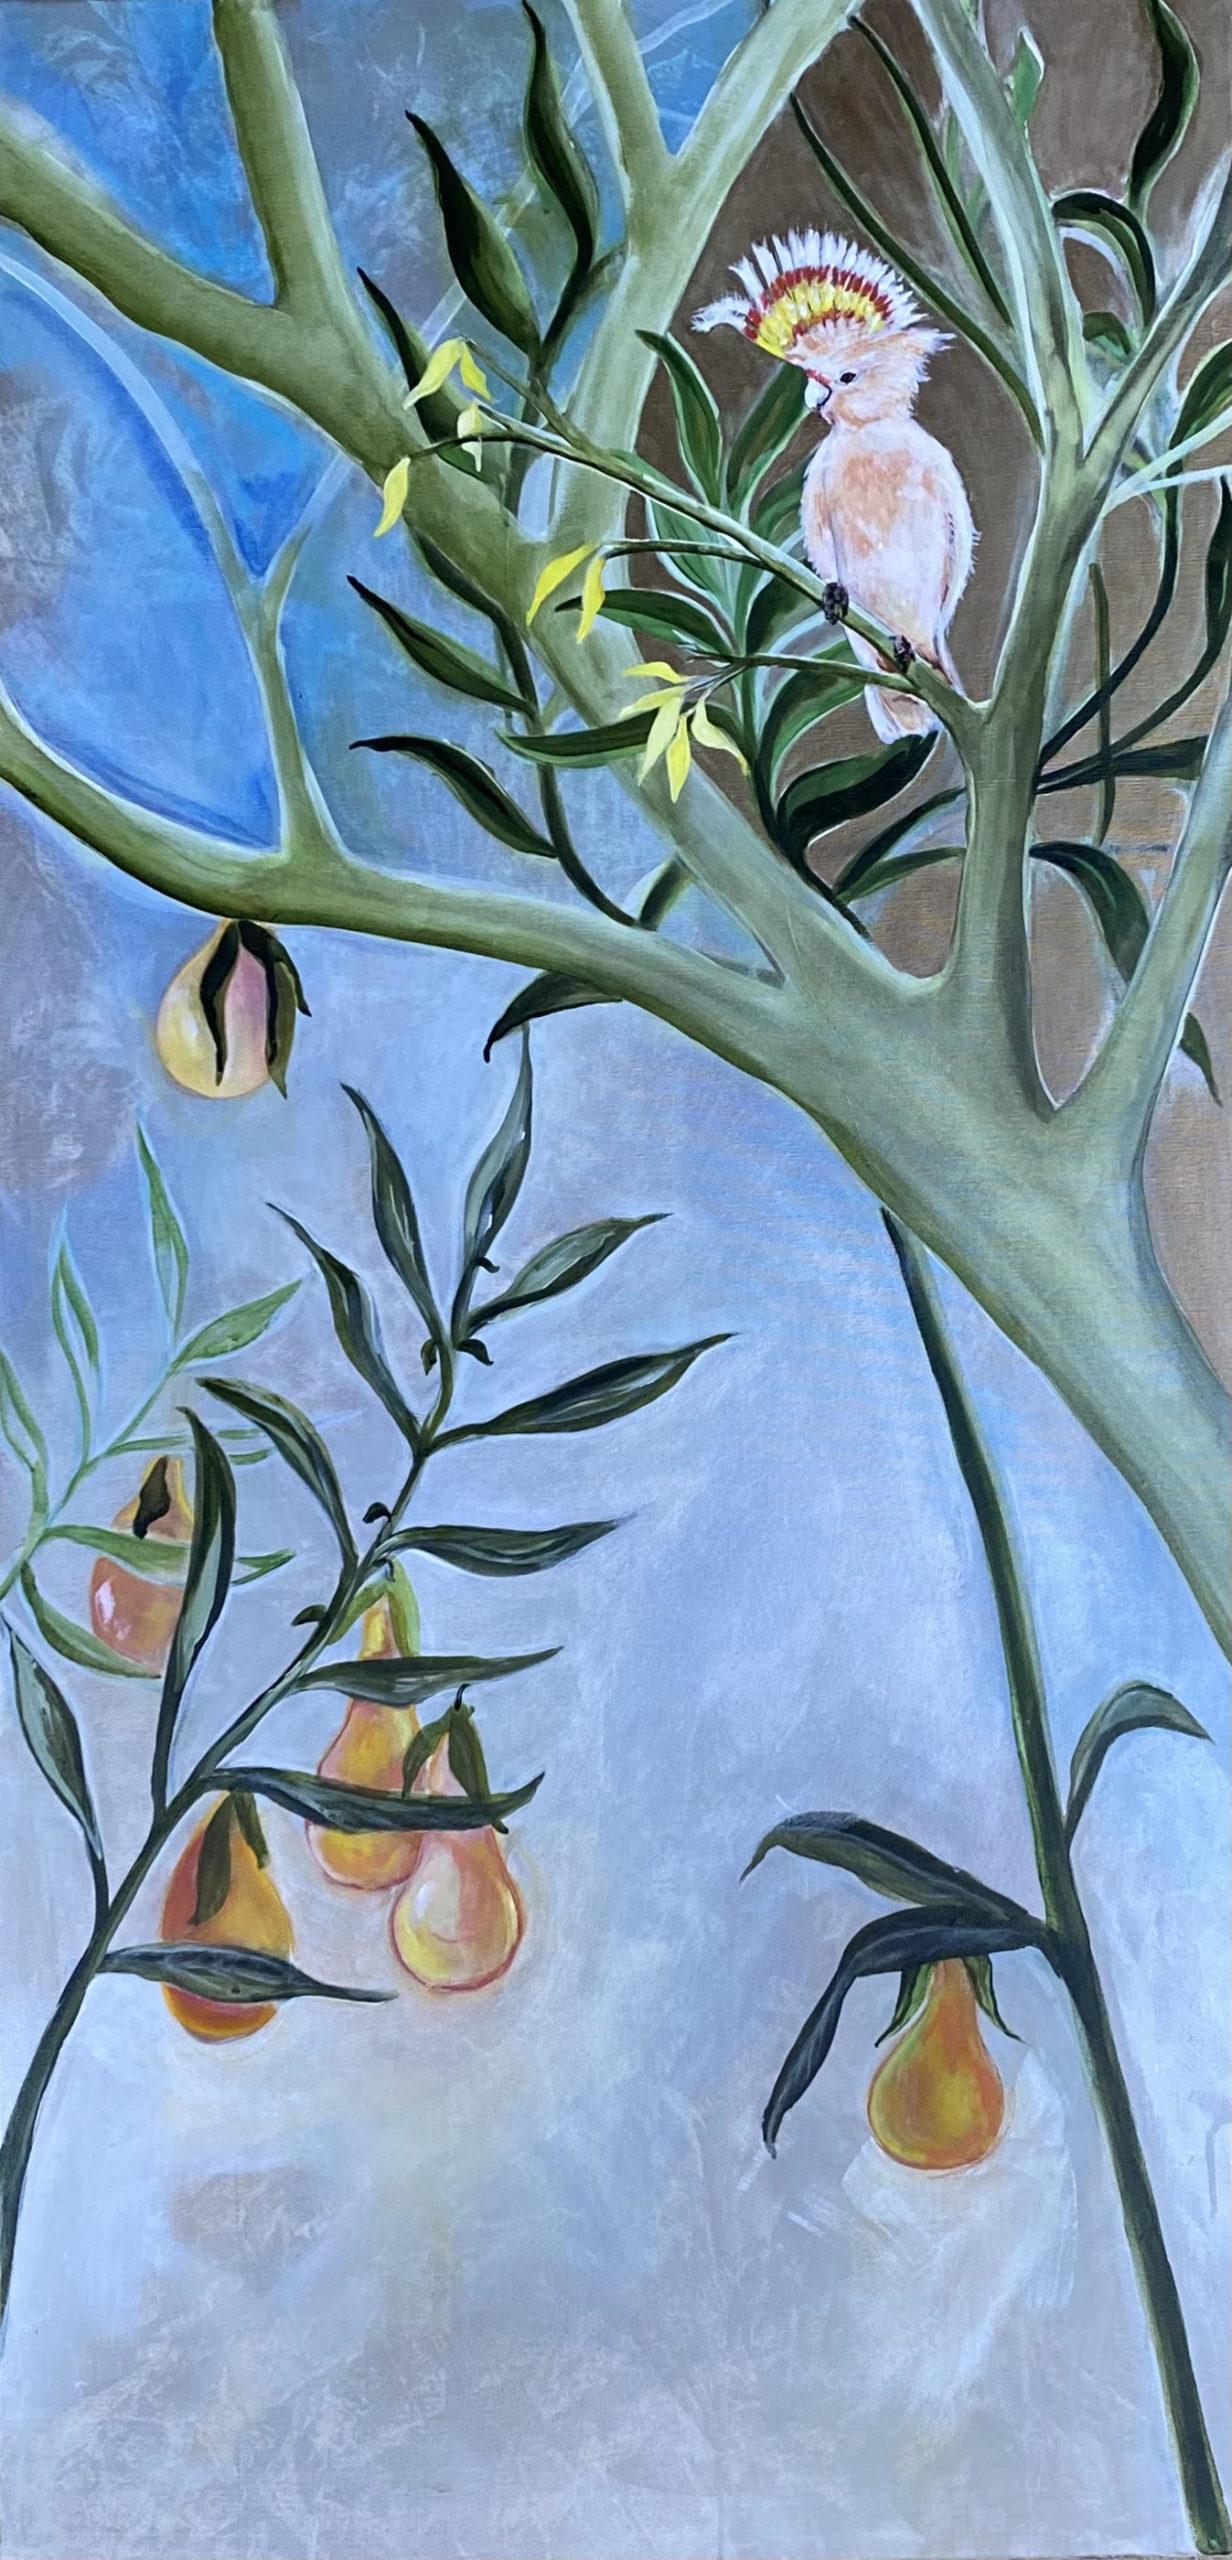 Perch & Pair painting (alt. view 2)